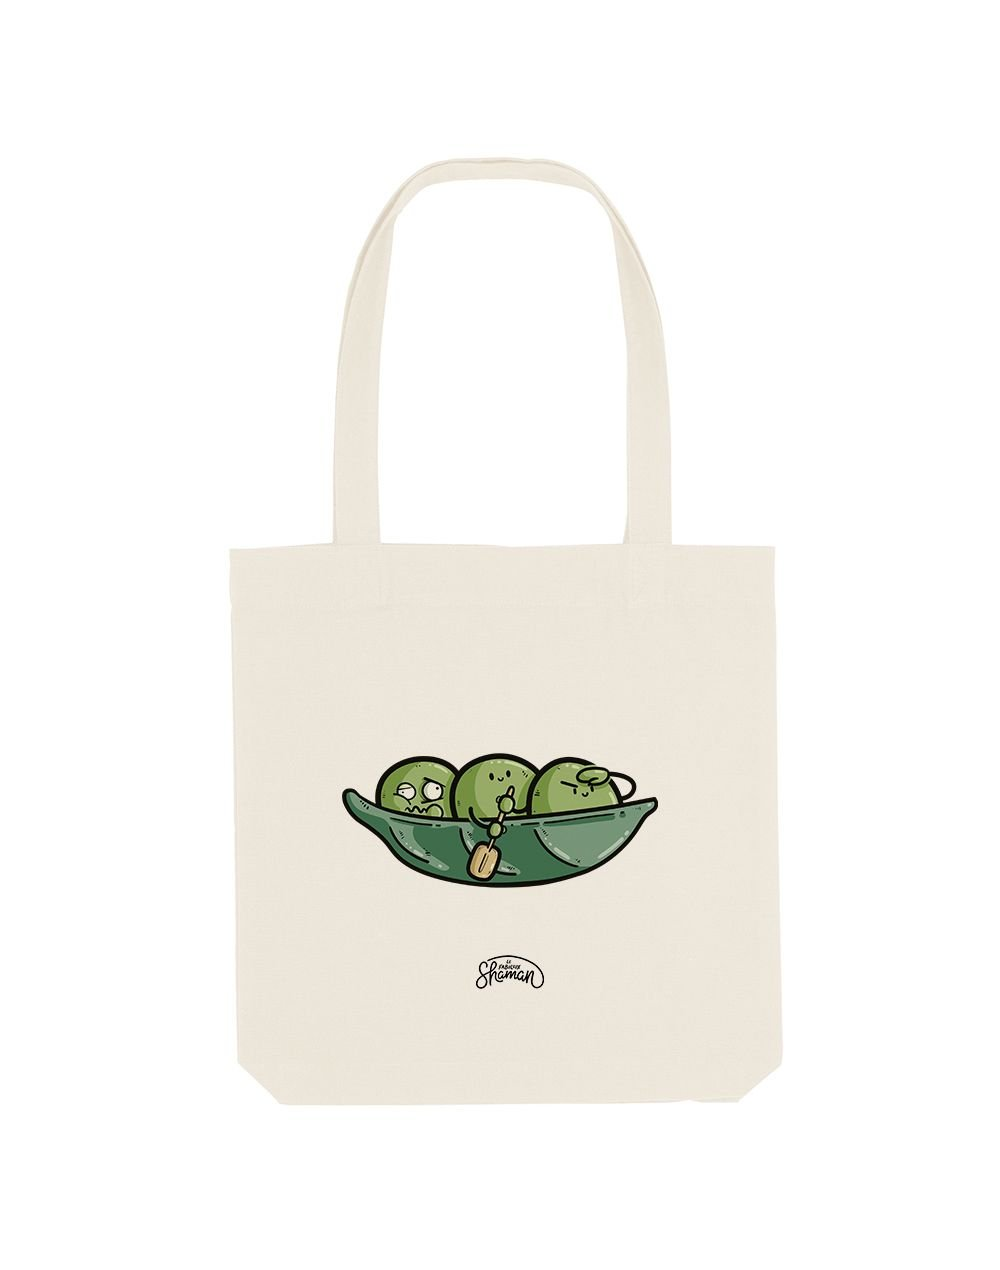 PETIT POIS KAYAK - Tote Bag  Crème  en coton